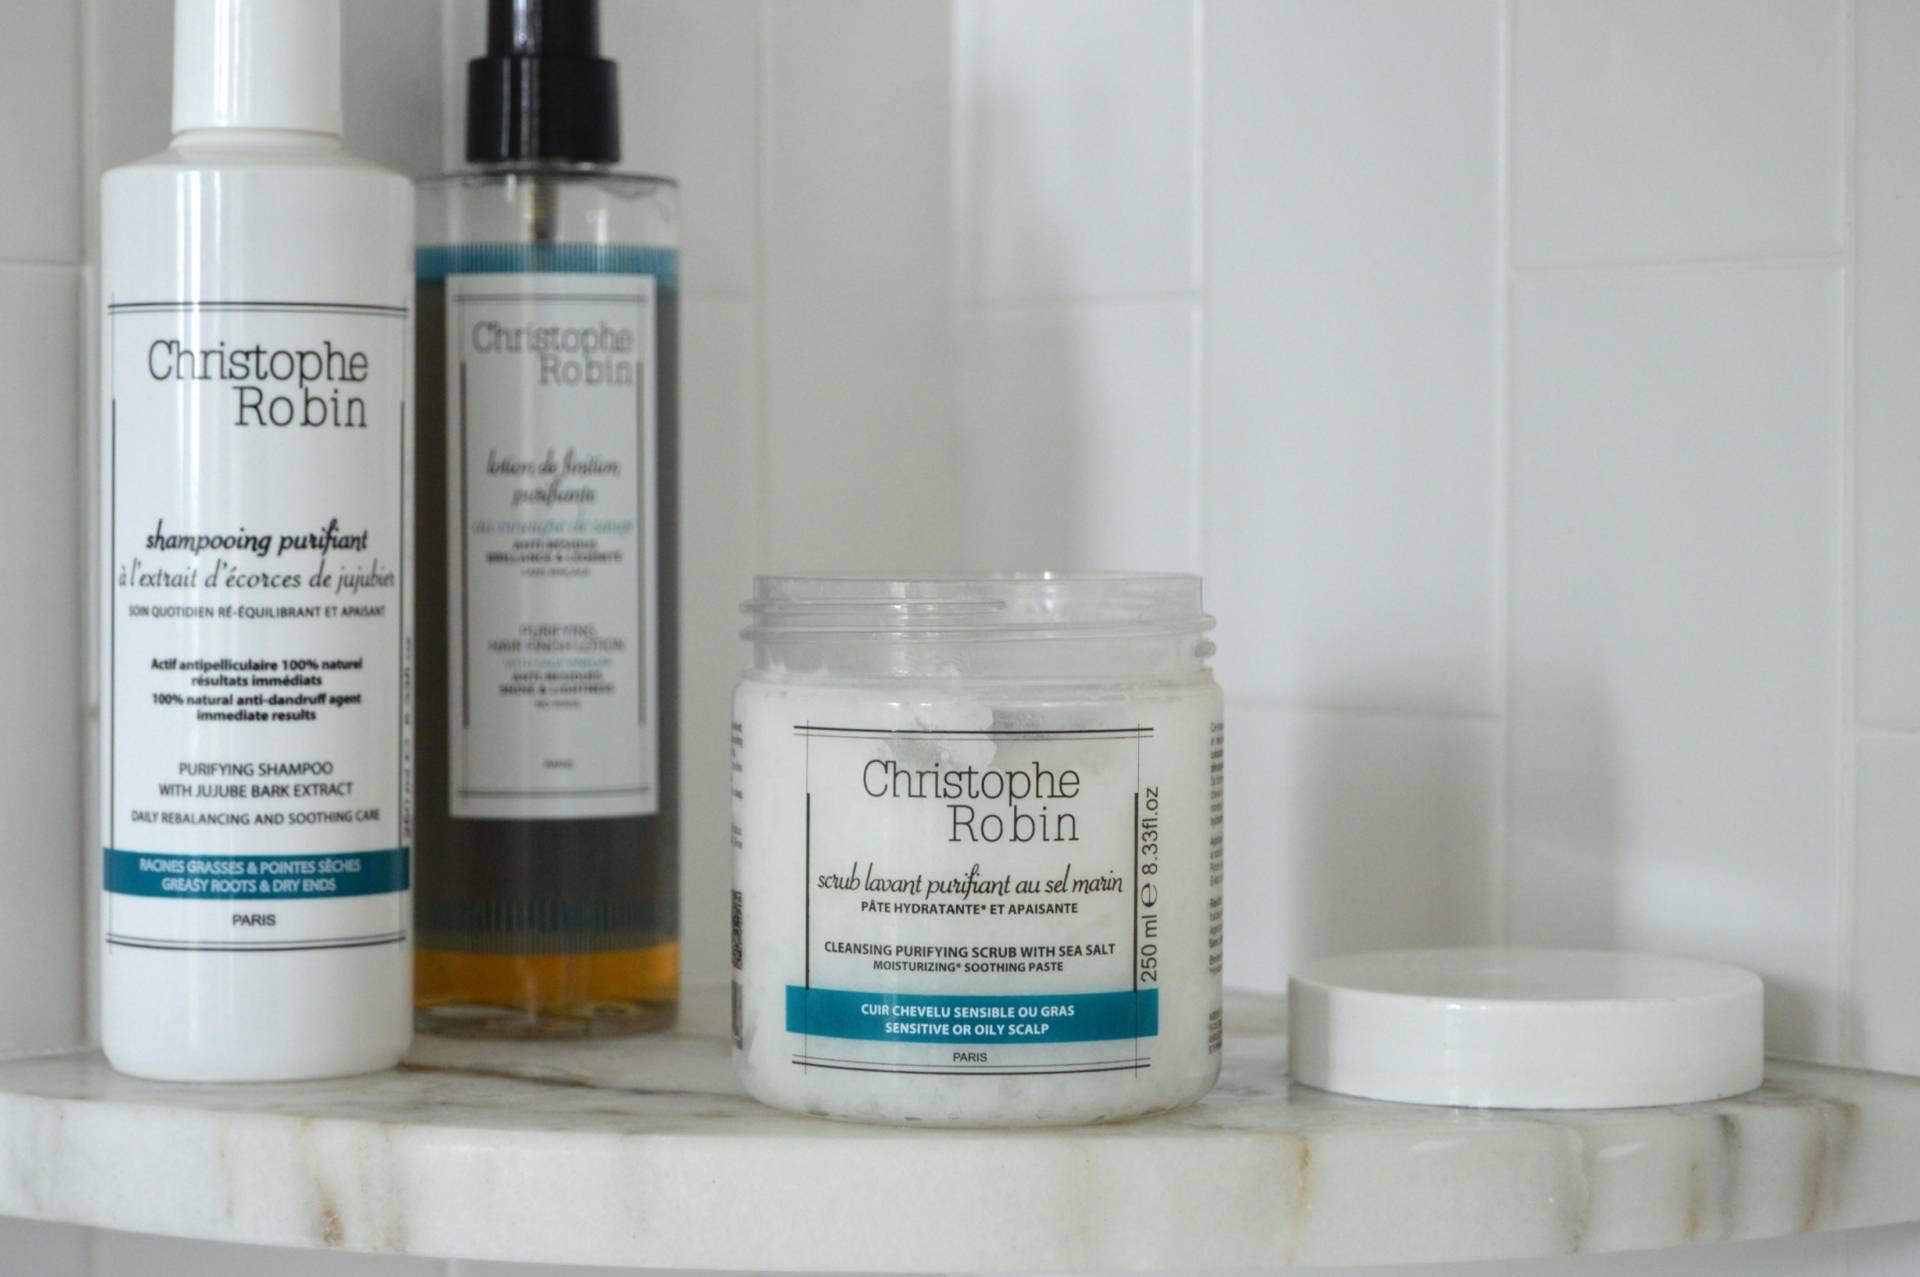 christophe-robin-paris-purifying-hair-care-shampoo-salt-scrub-review-inhautepursuit